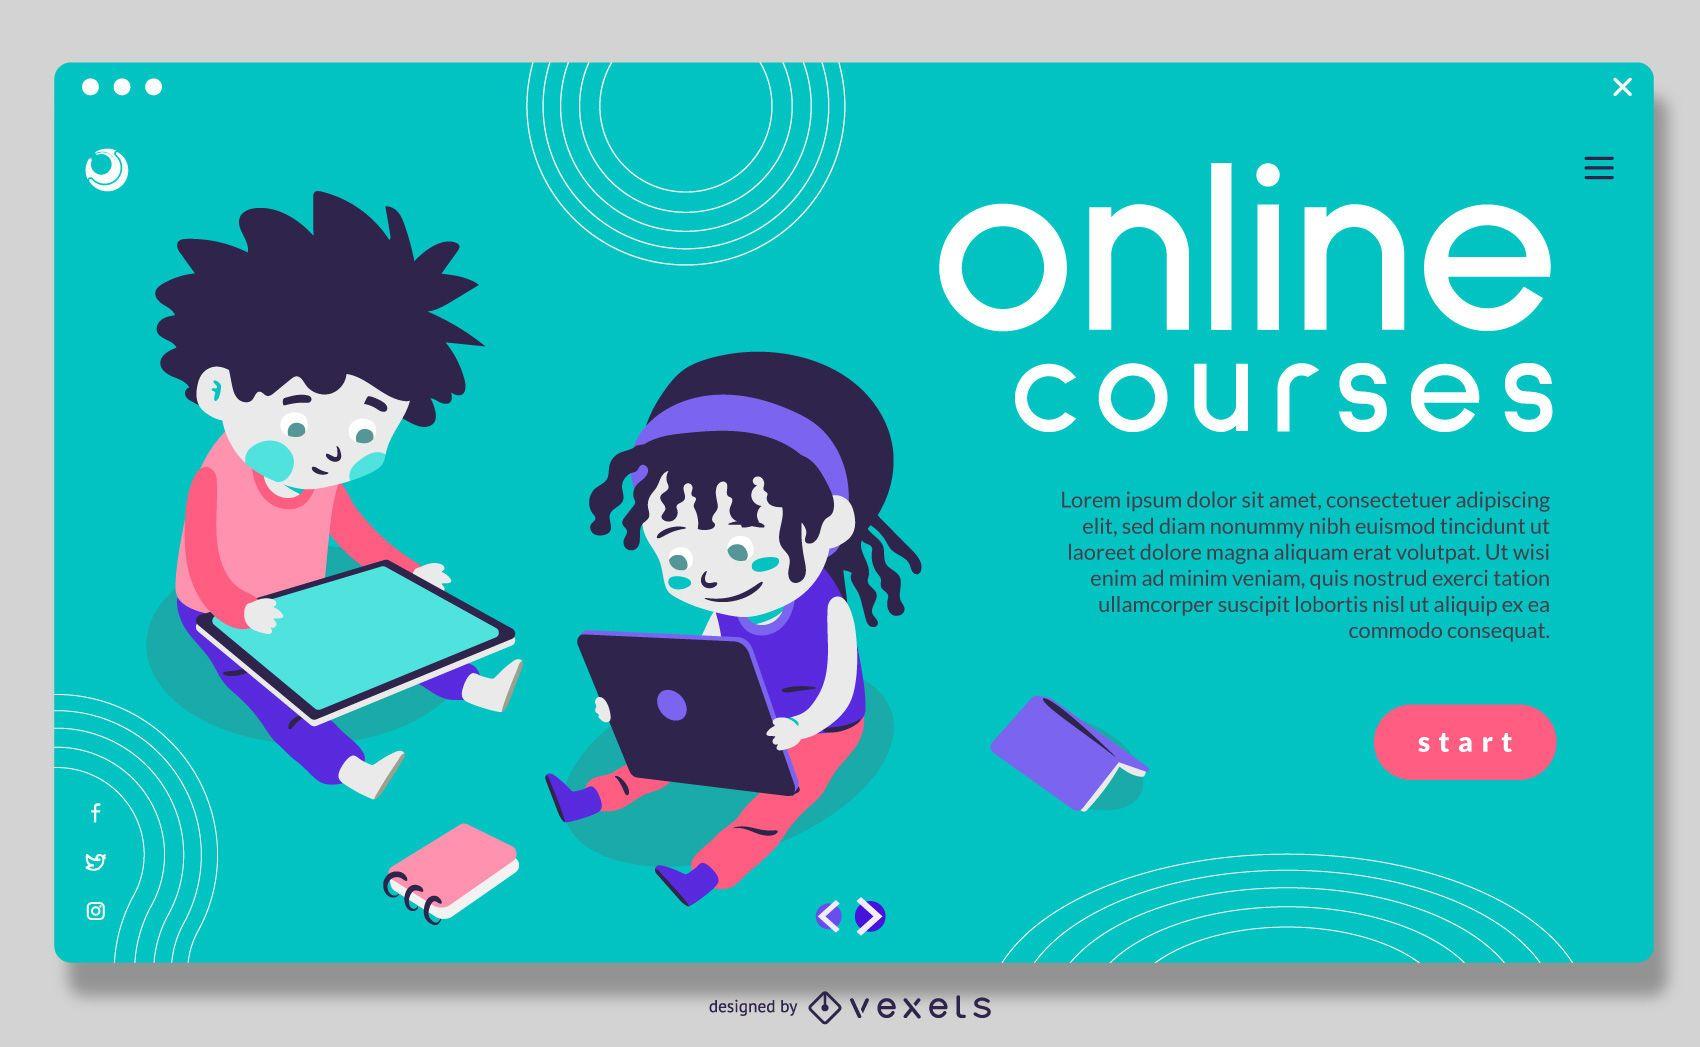 Online-Kurse Kinder Fullscreen Slider Design